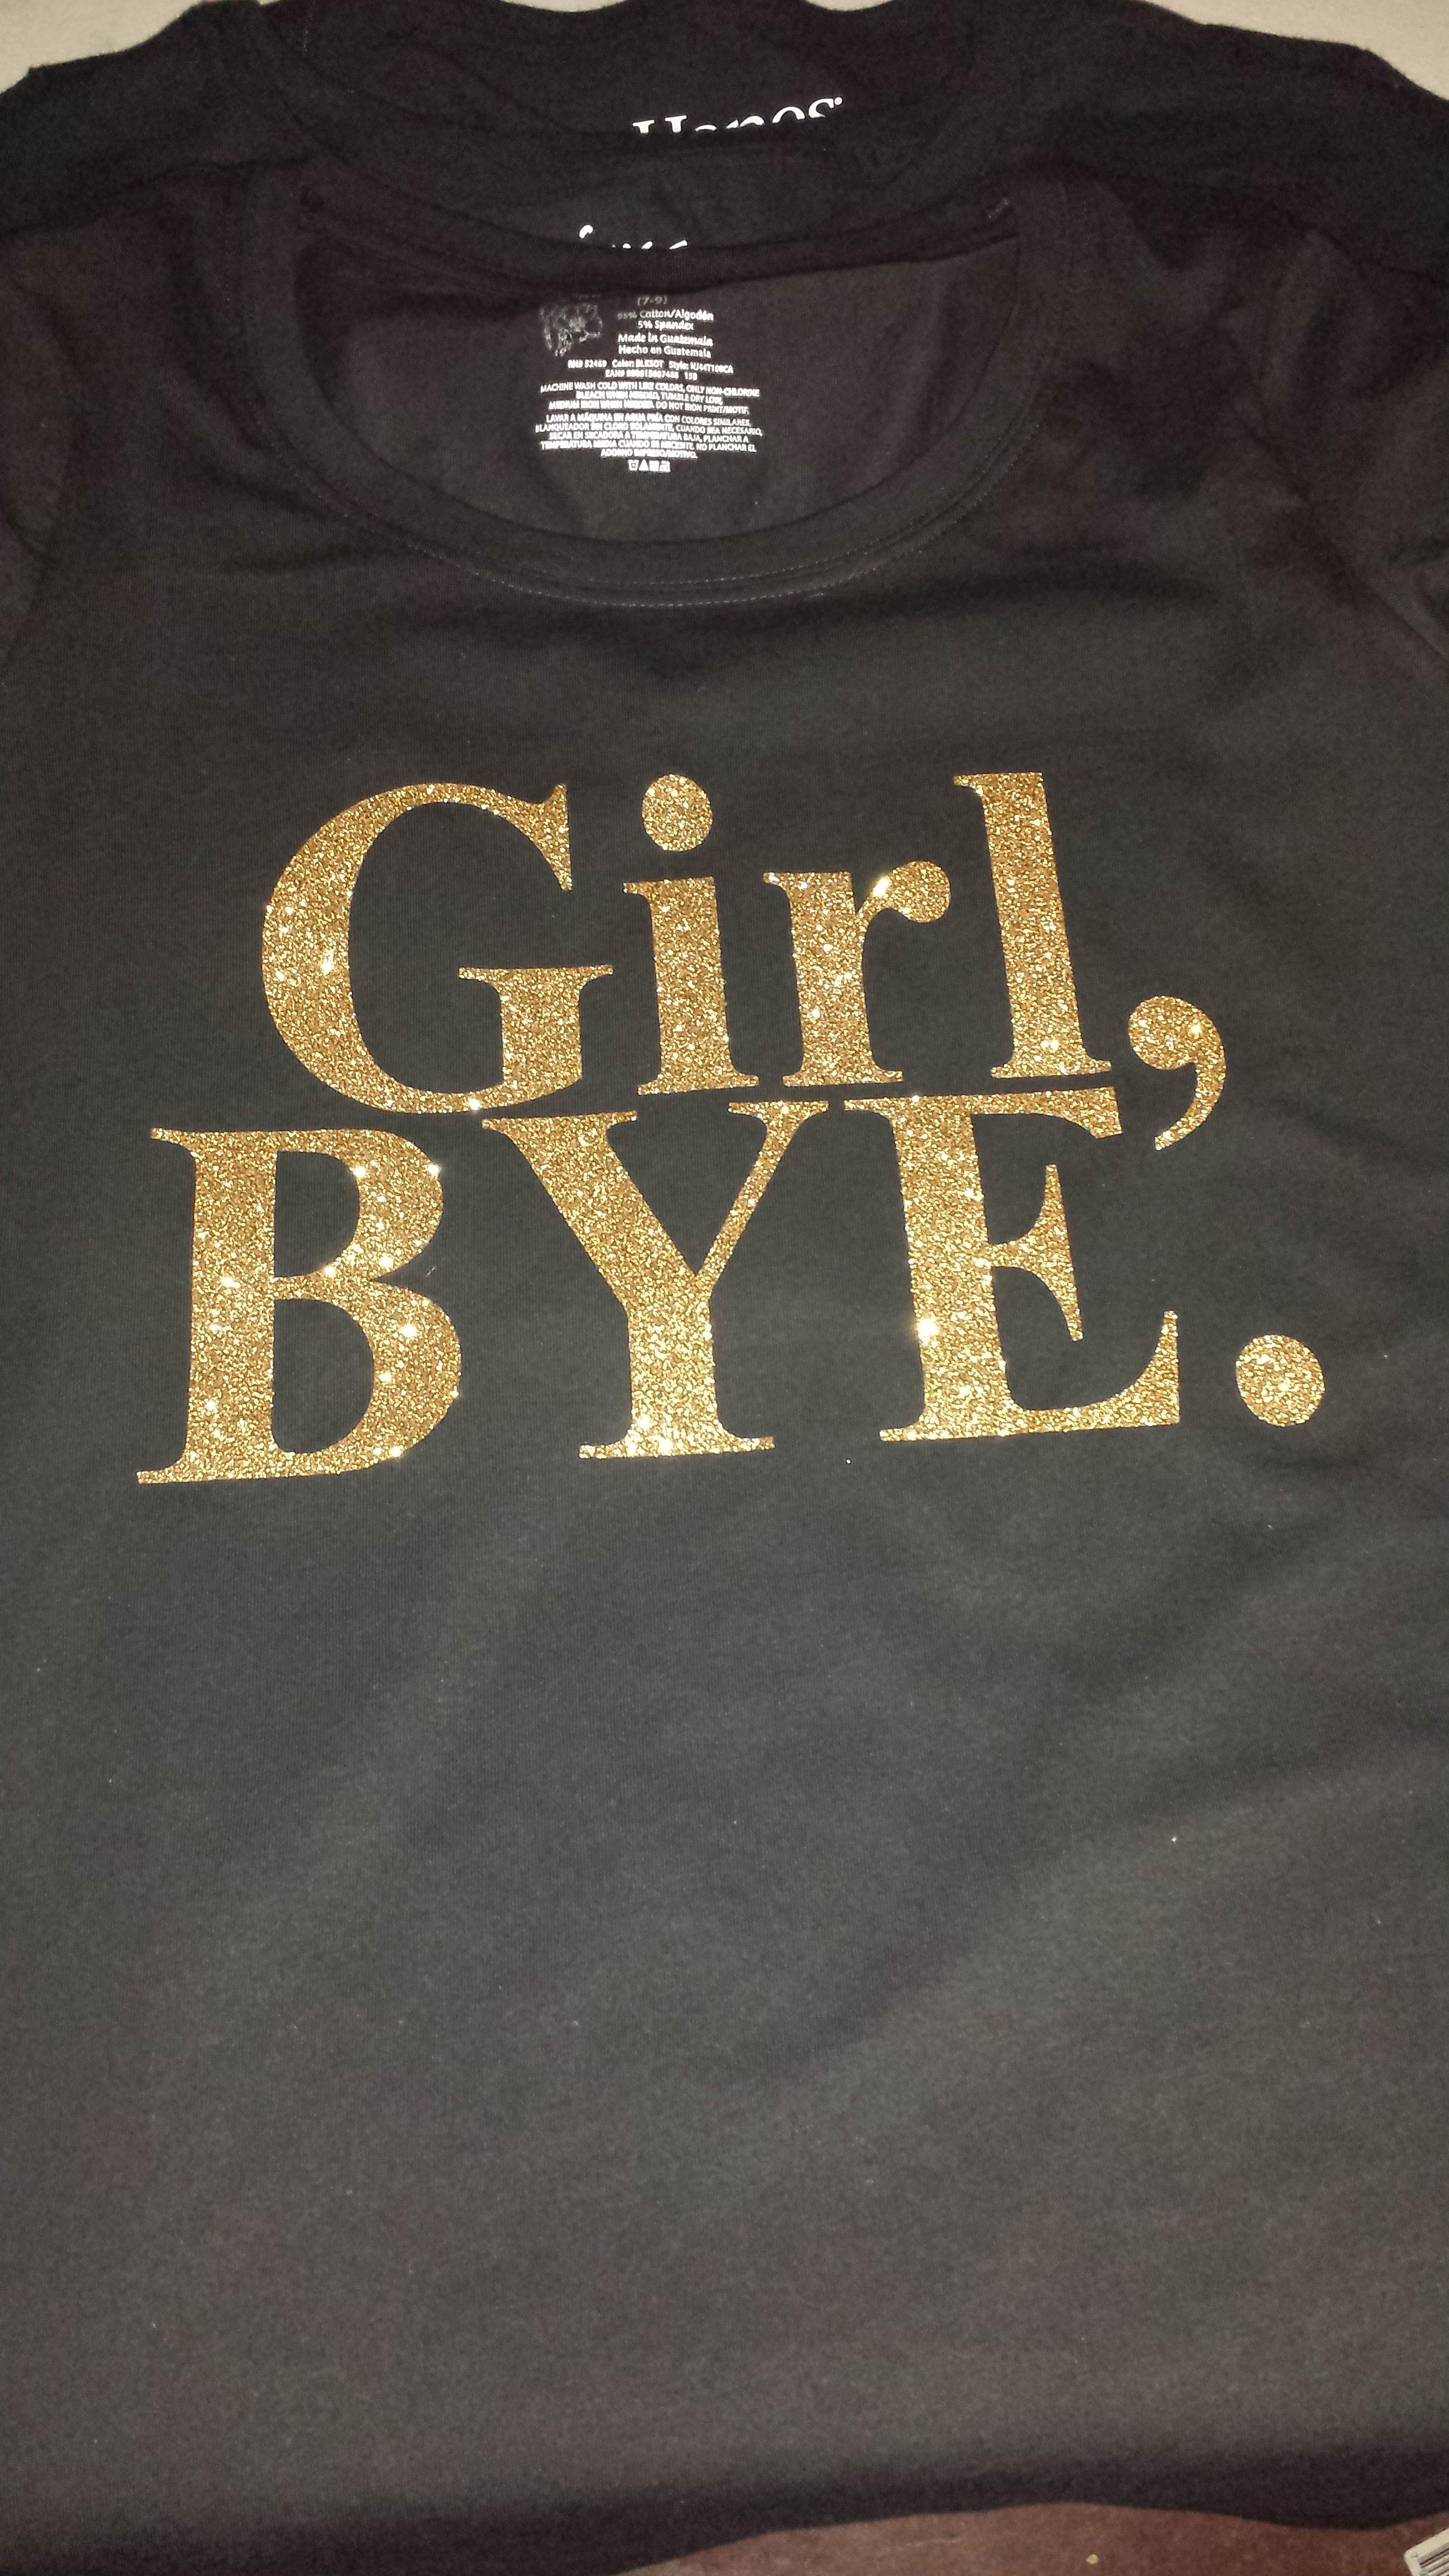 Girl Bye T Shirt Glitter Vinyl Creative Collection By Shon